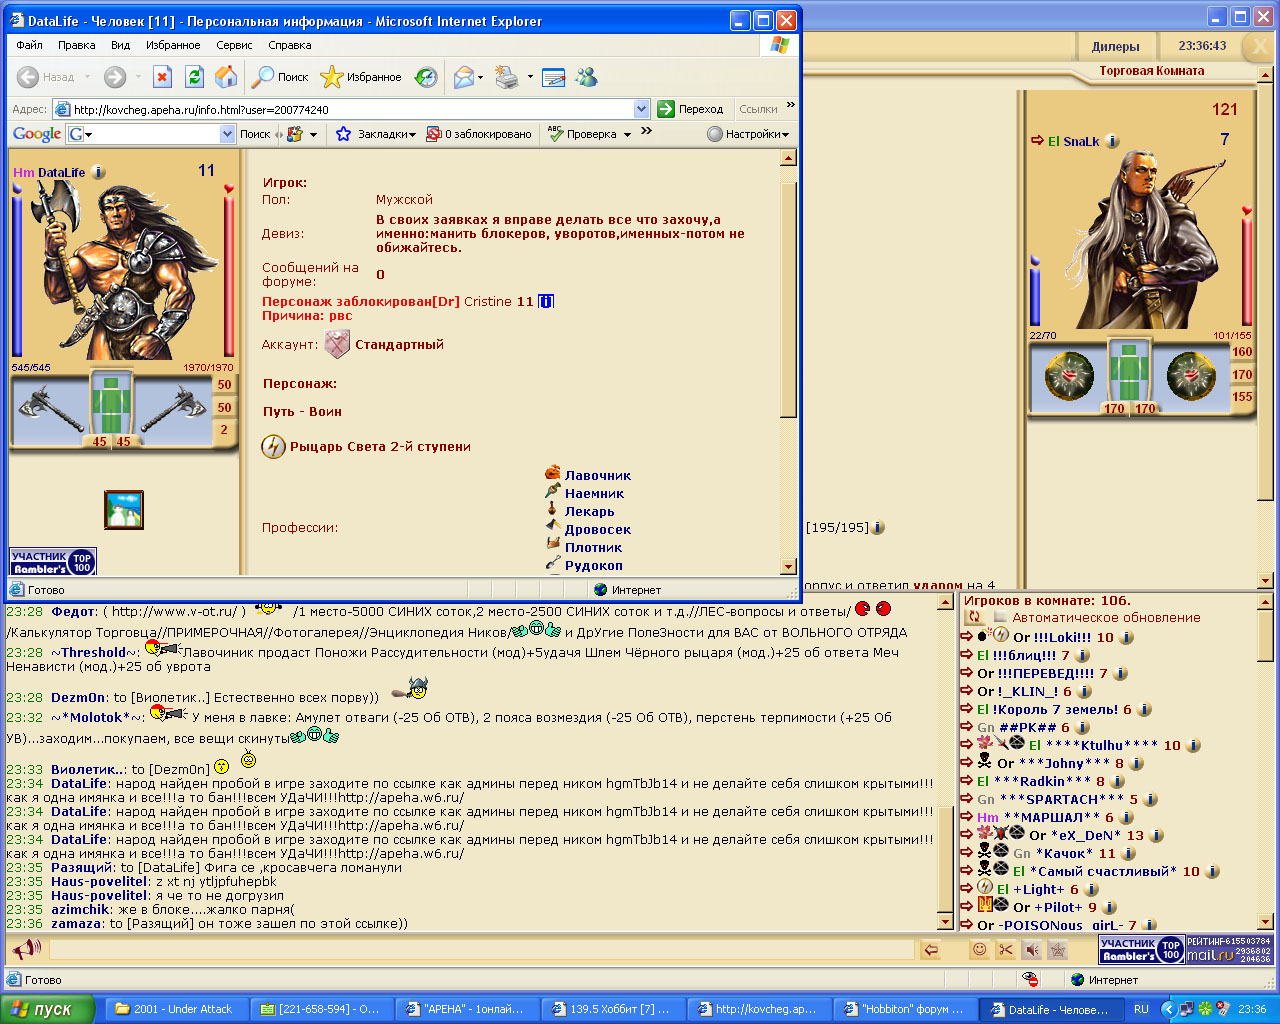 Cs 16 kuvvetmira clan serwer web sitesi - cs msn avatar